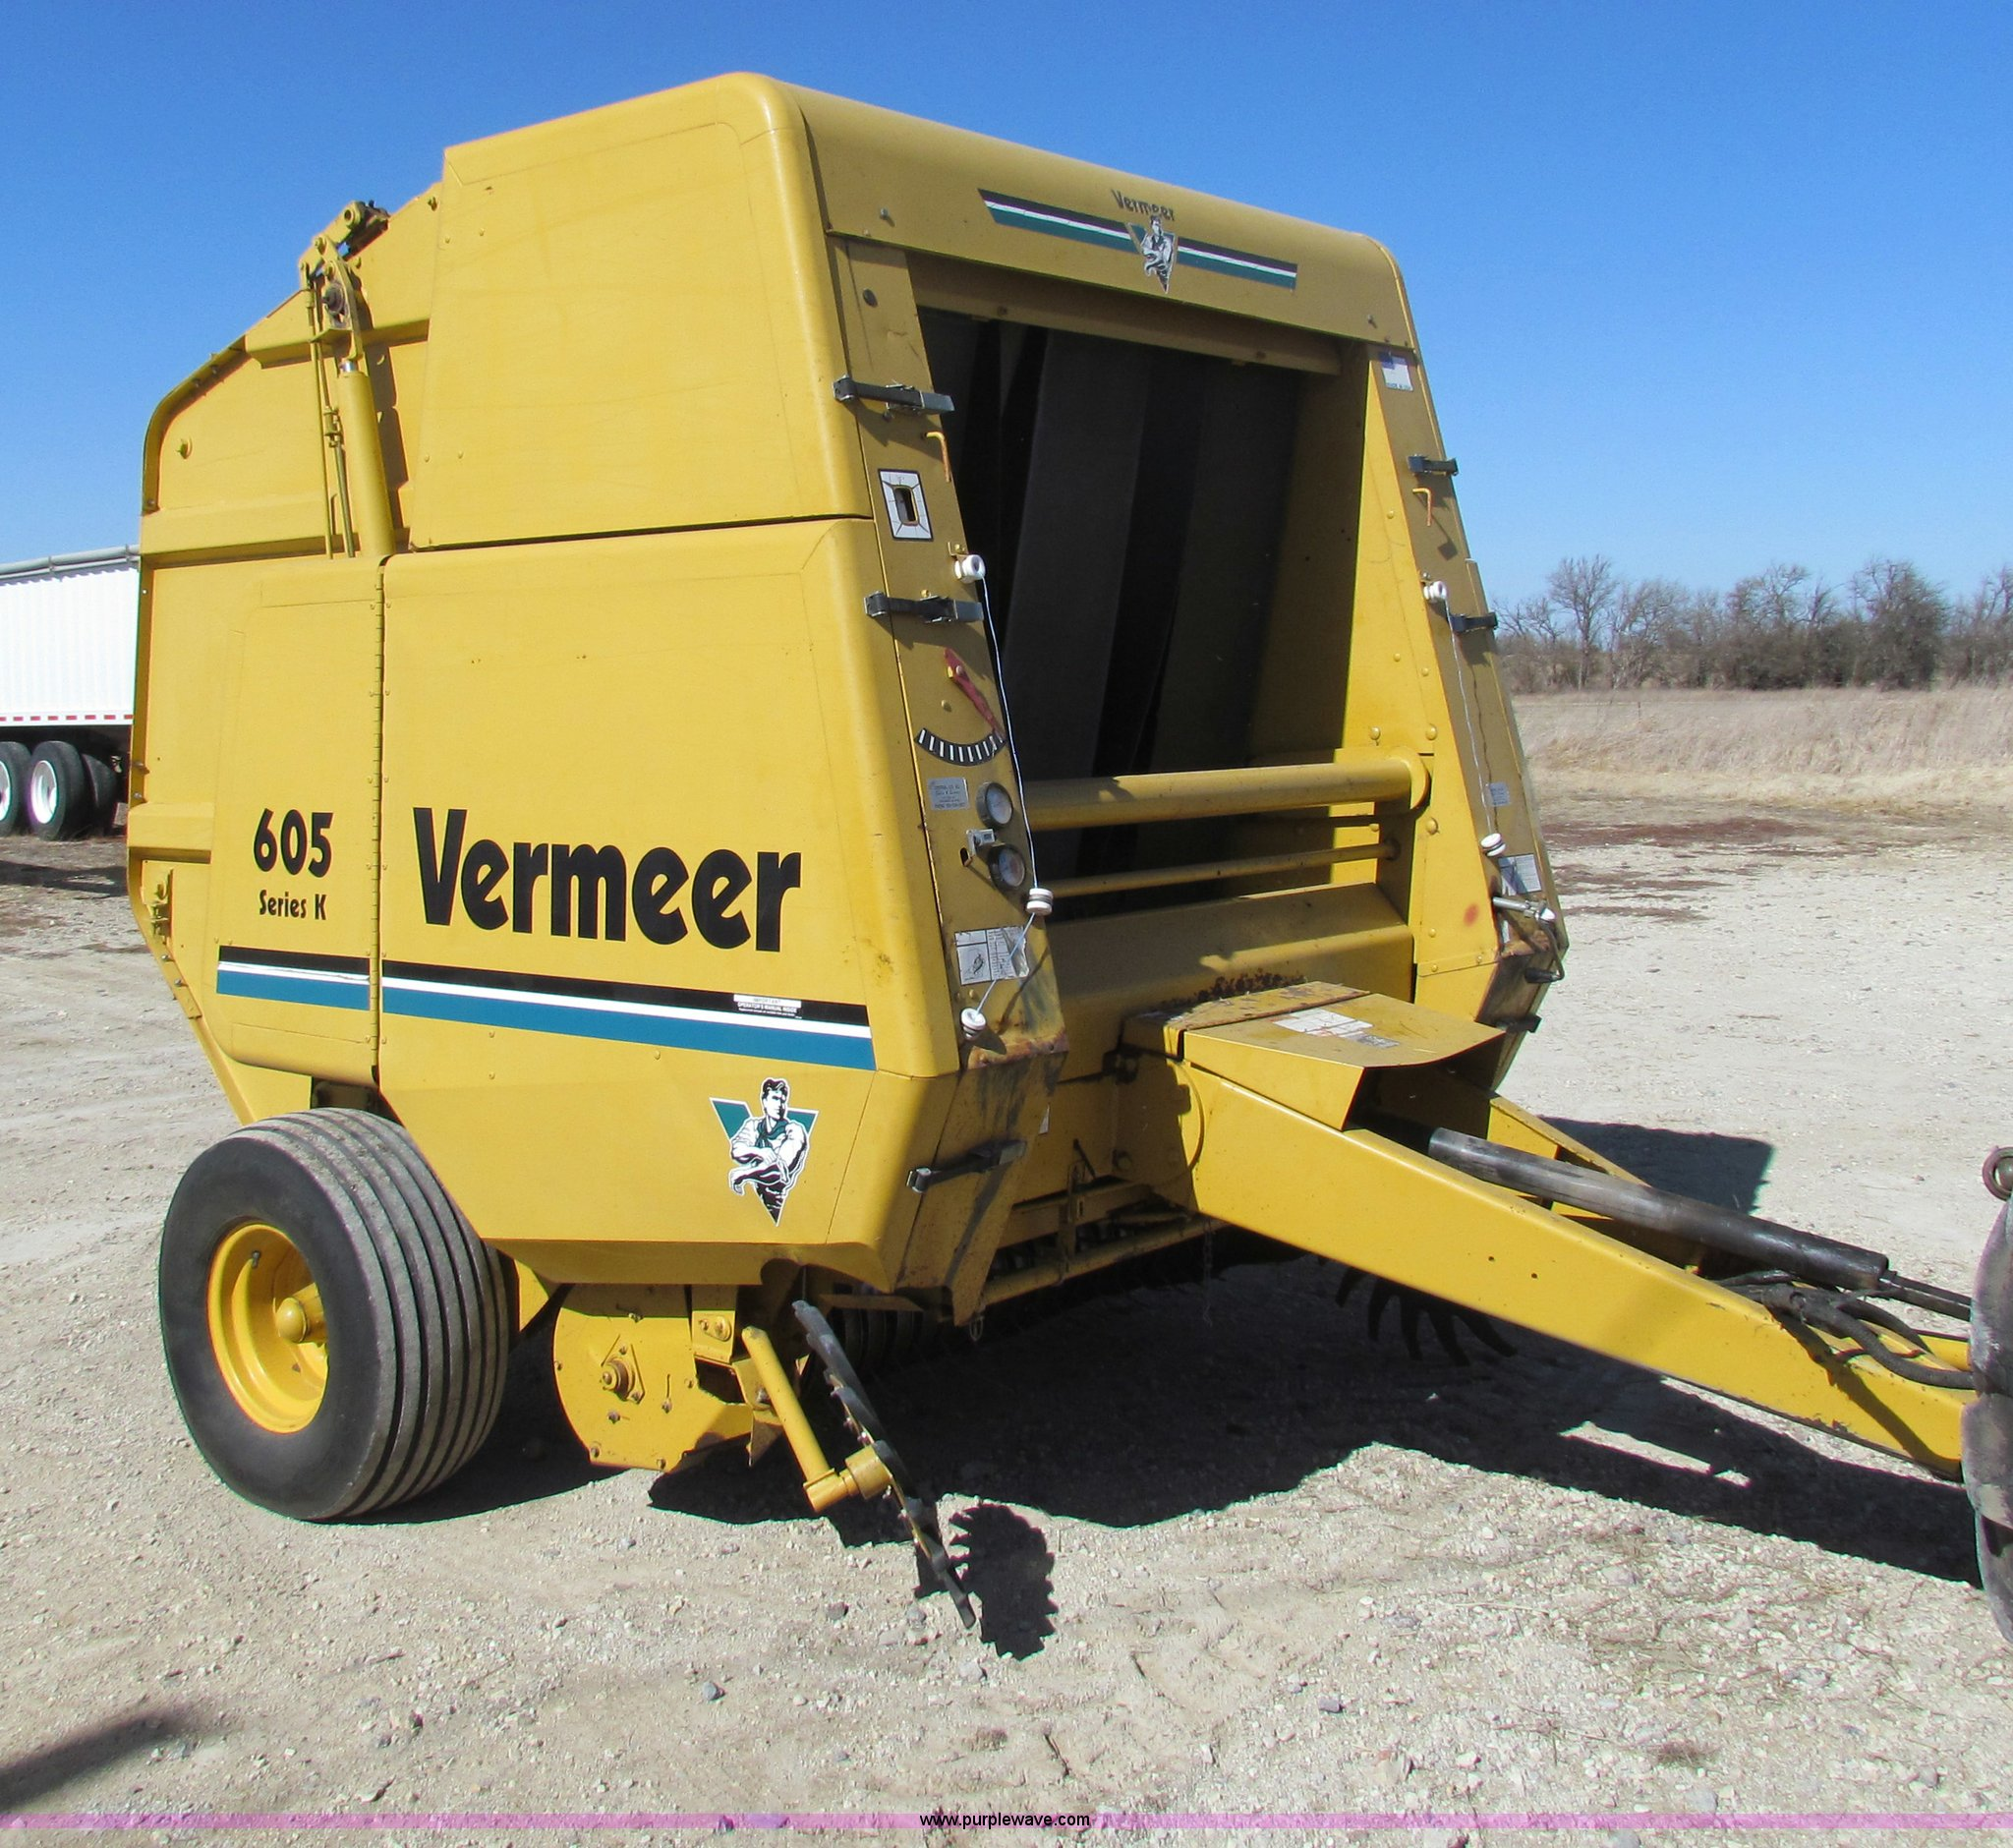 C1855 image for item c1855 vermeer 605k round baler